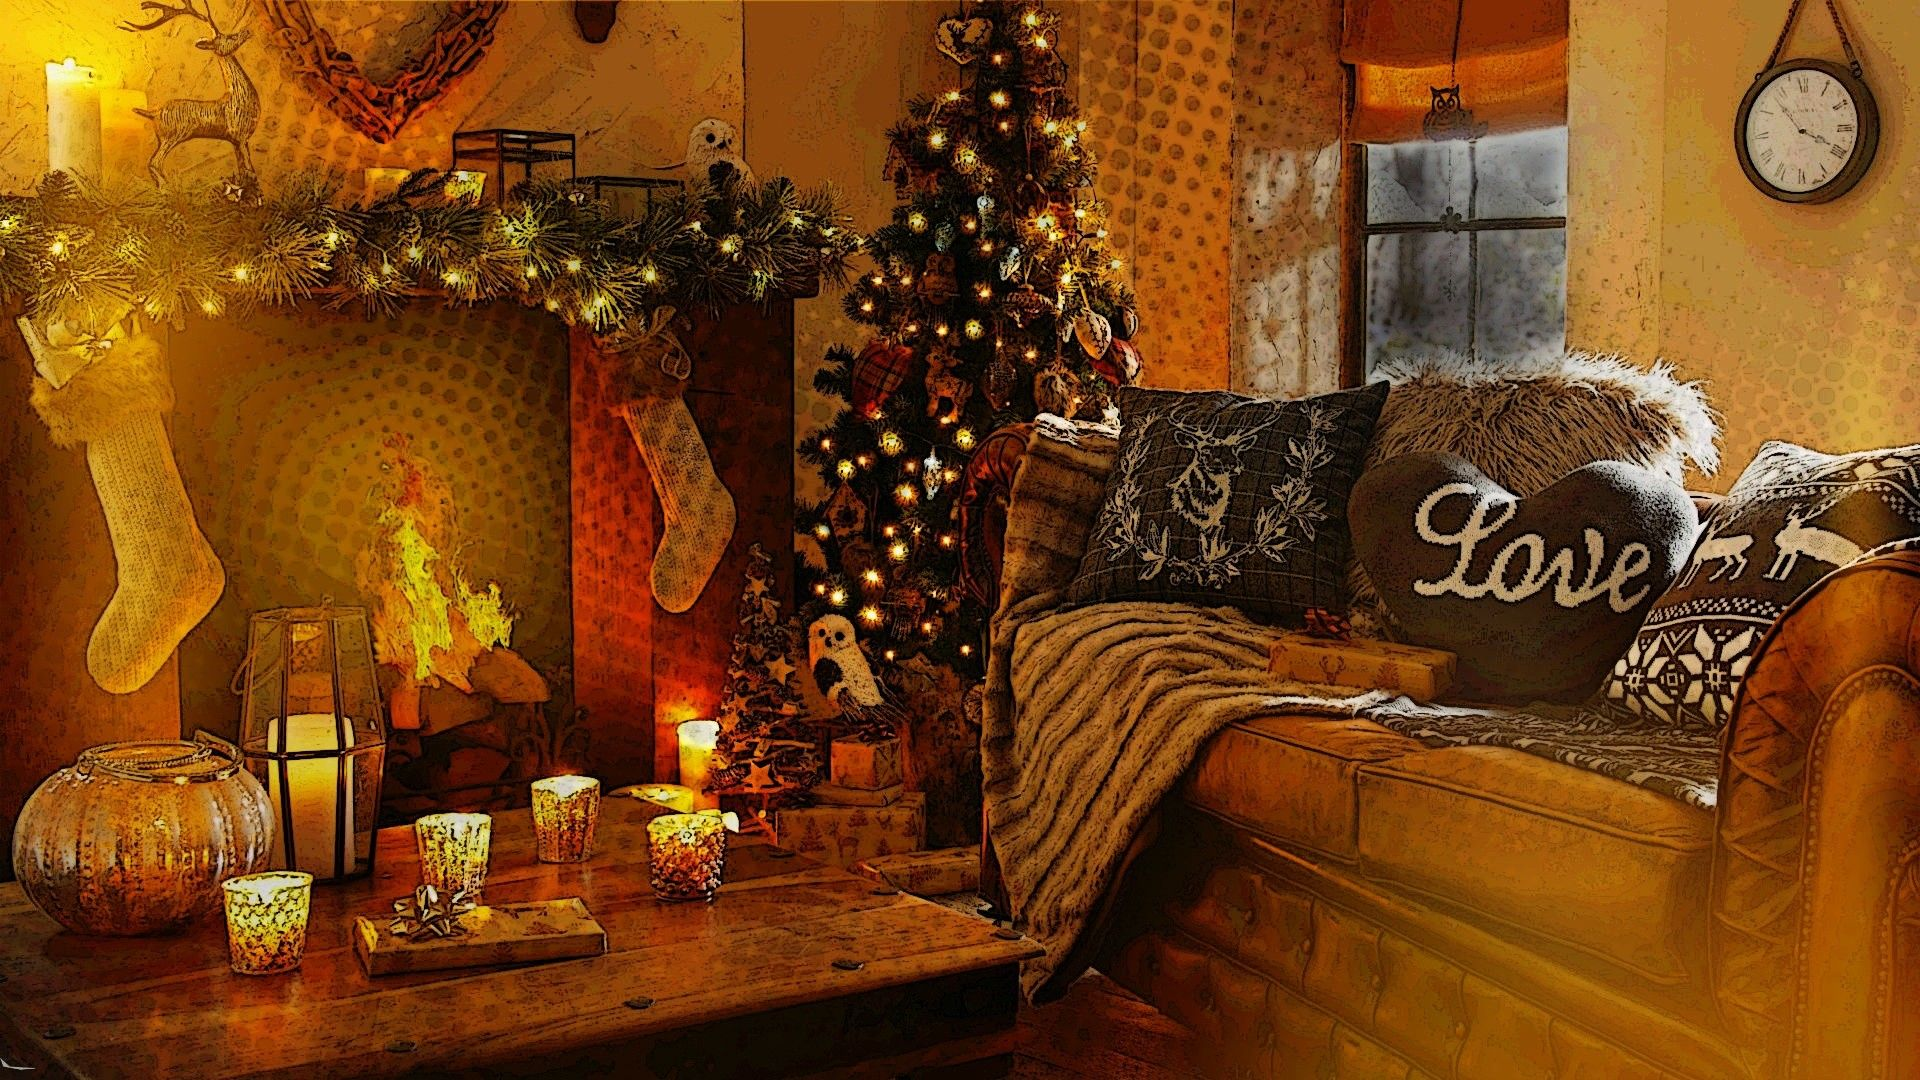 Christmas Fireplace Comfort free hd wallpaper